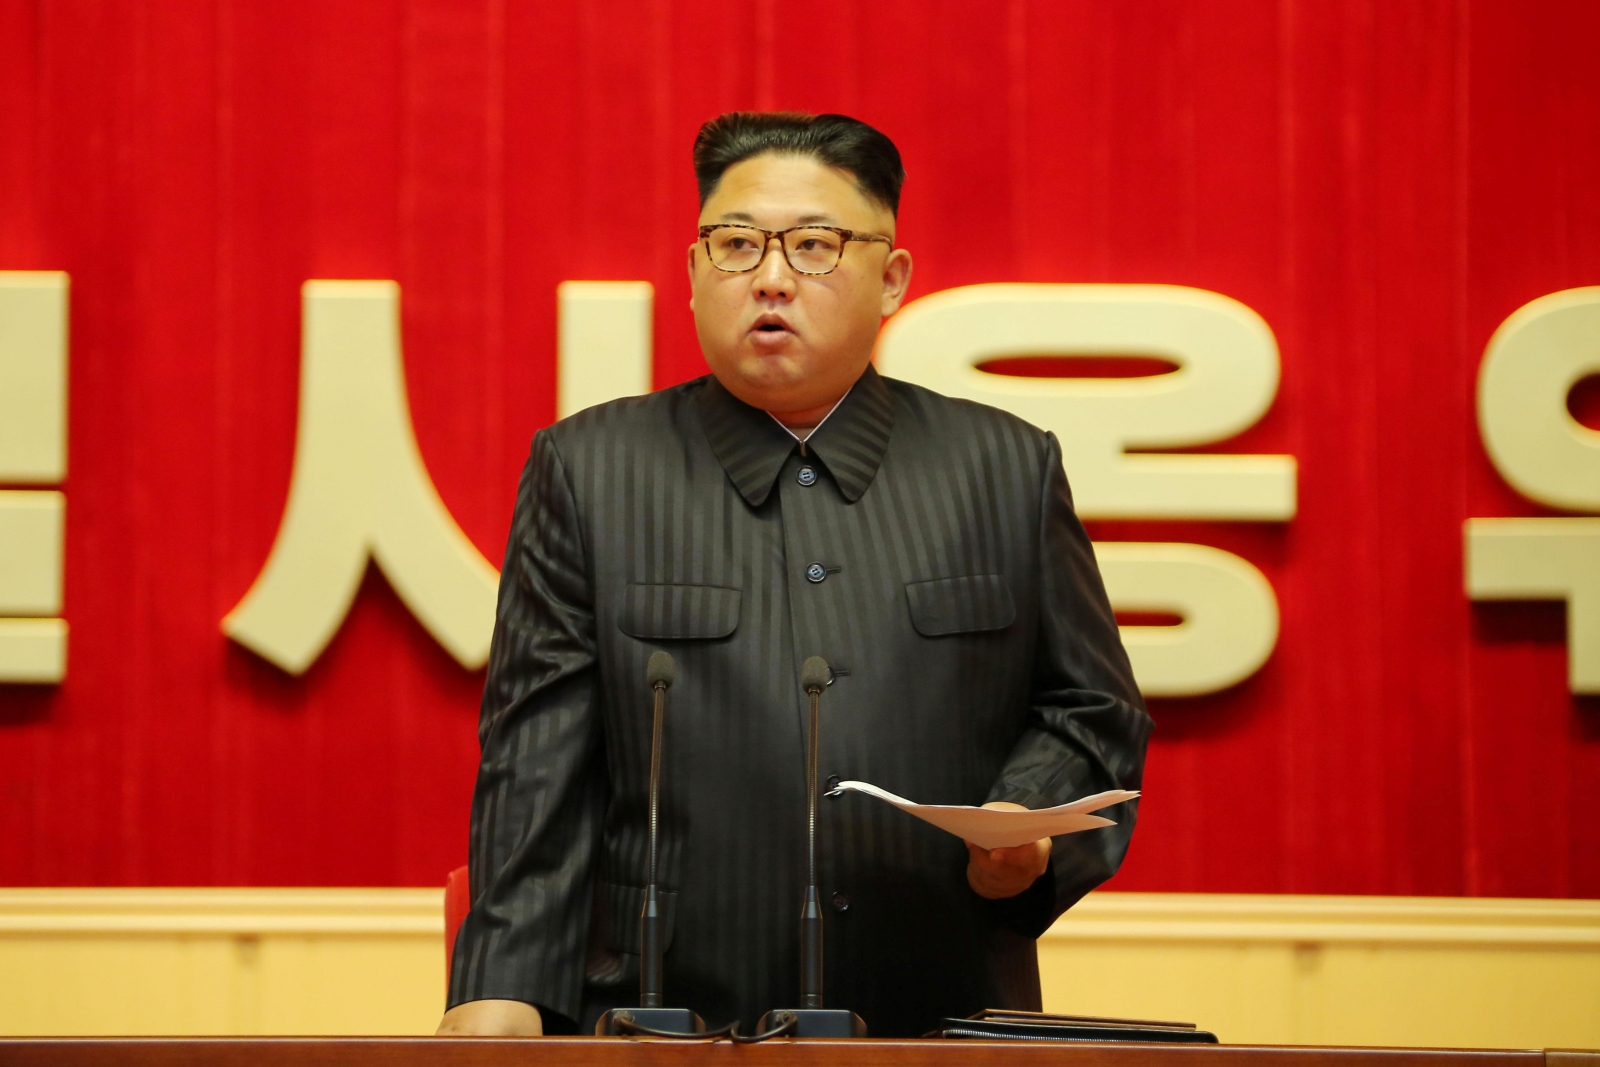 North Korea defection Kim Jong-un